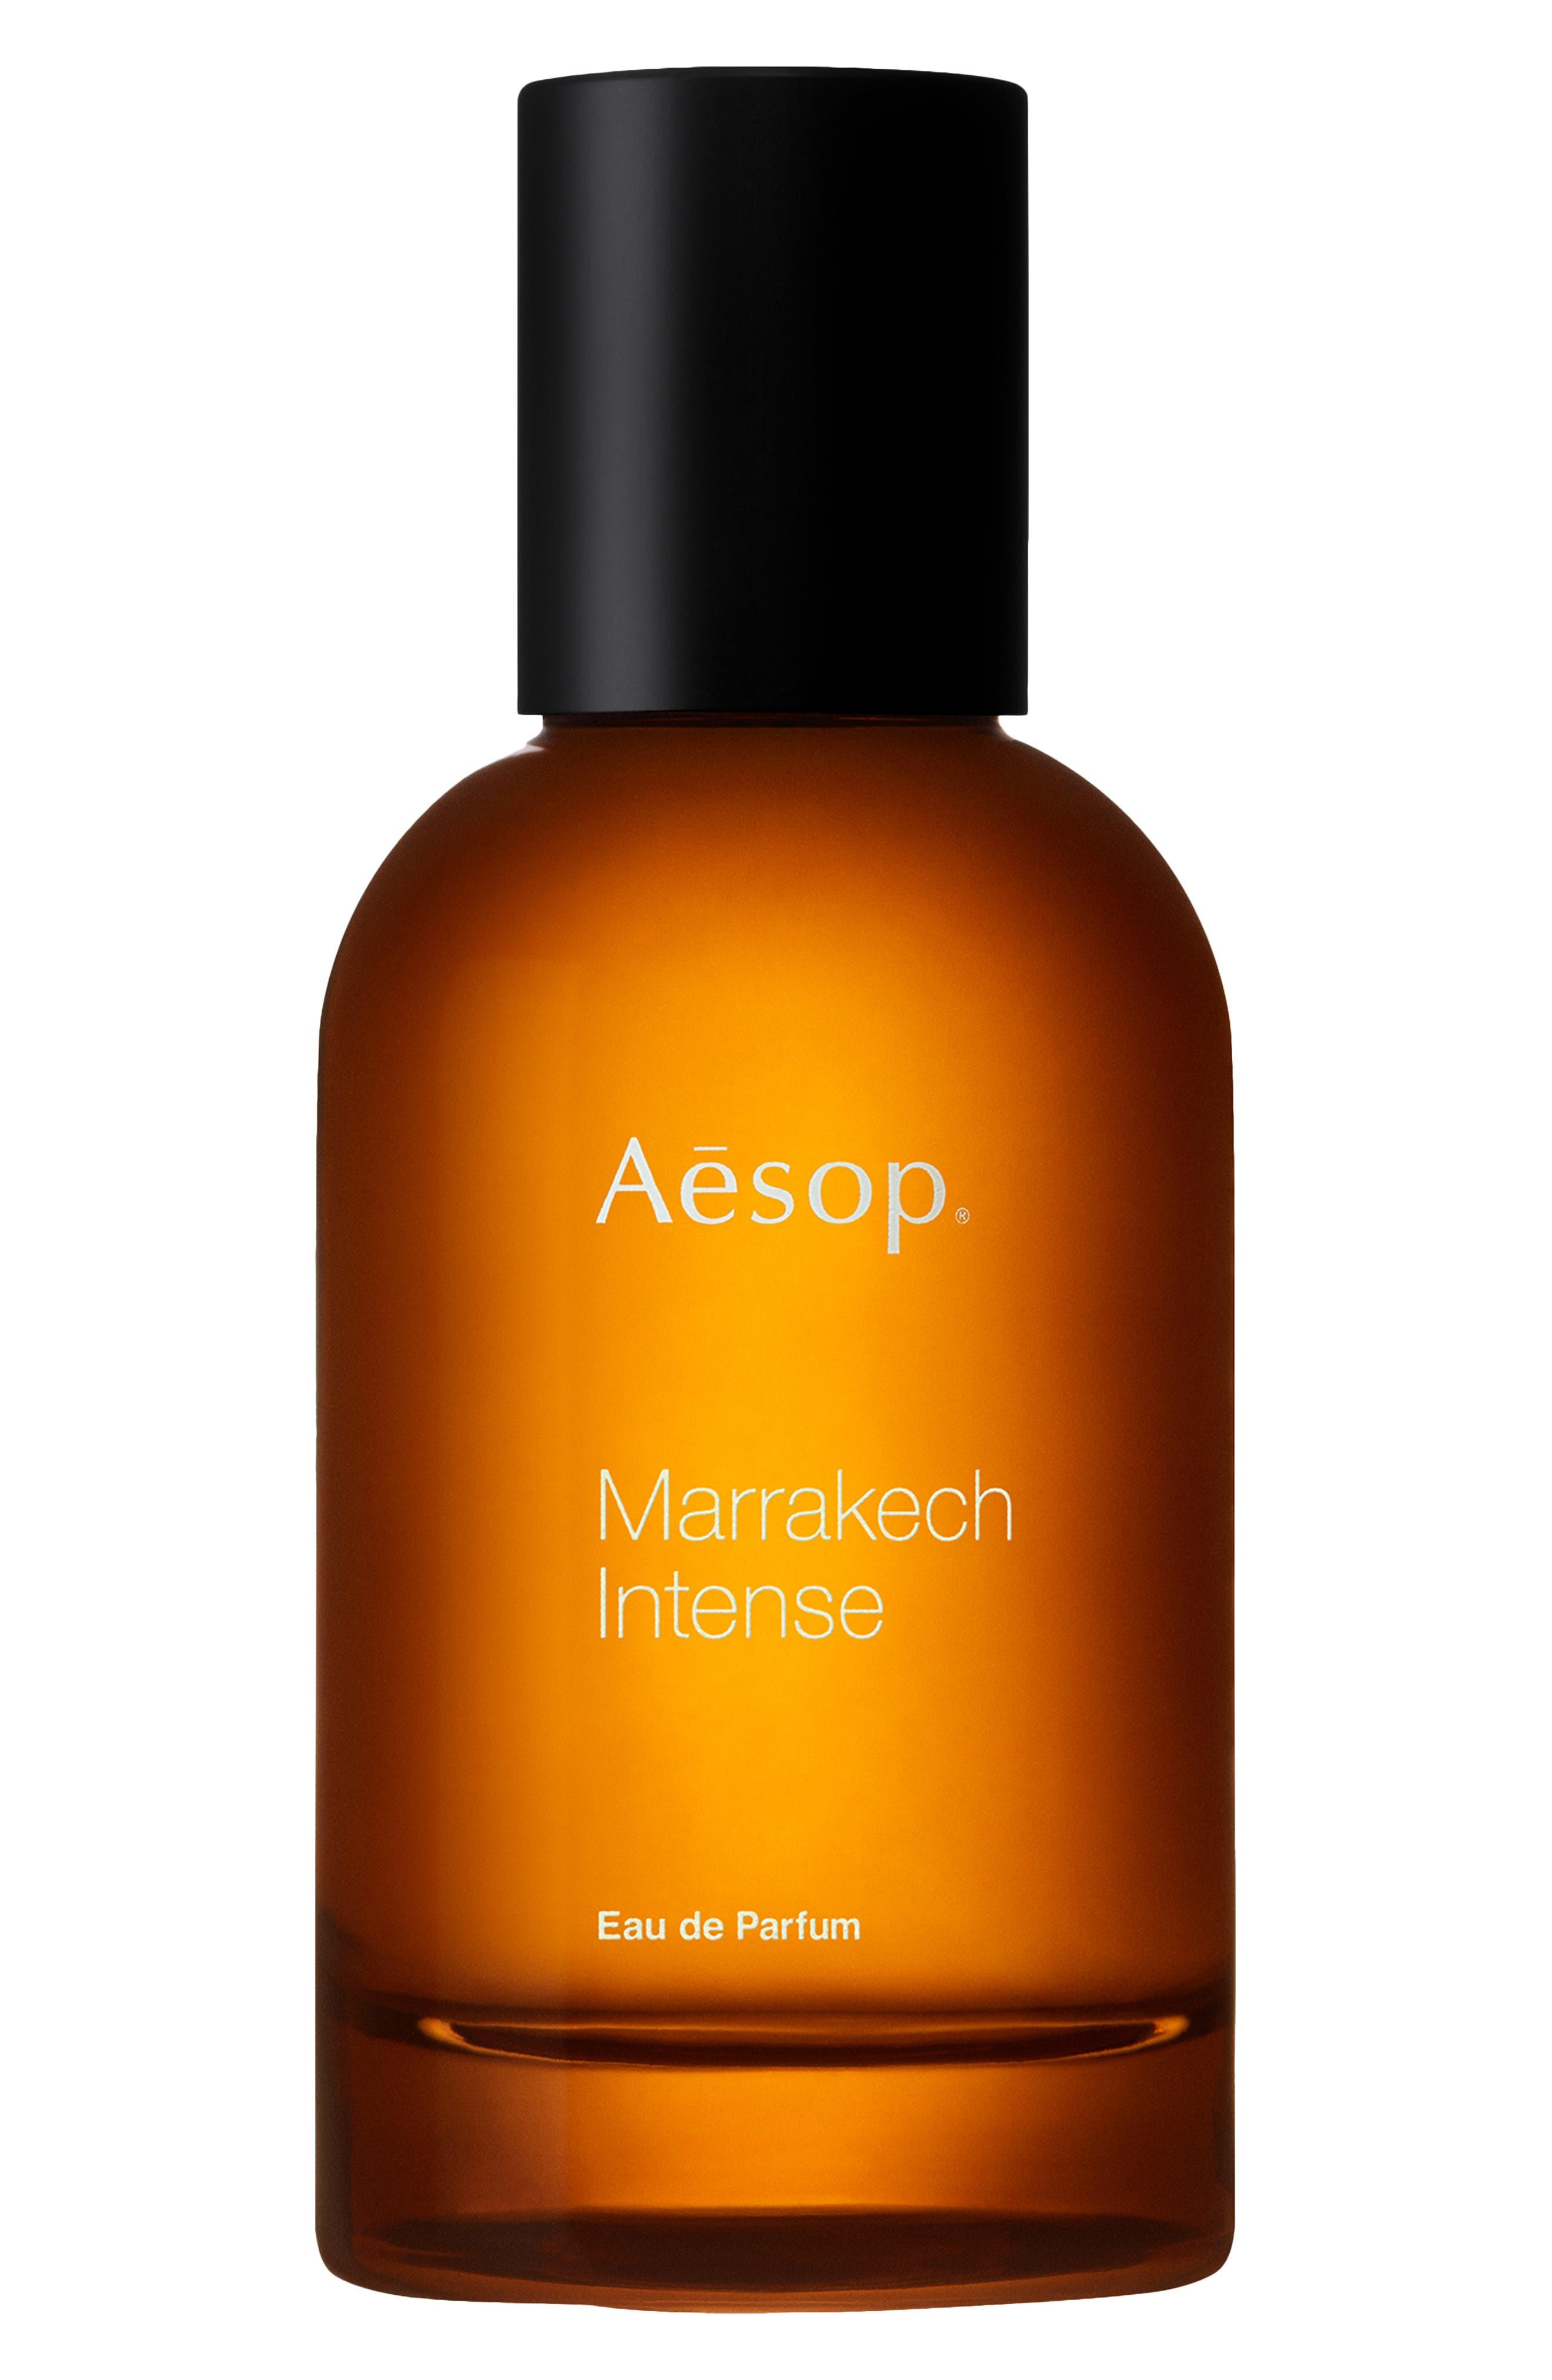 Marrakech Intense Eau De Parfum